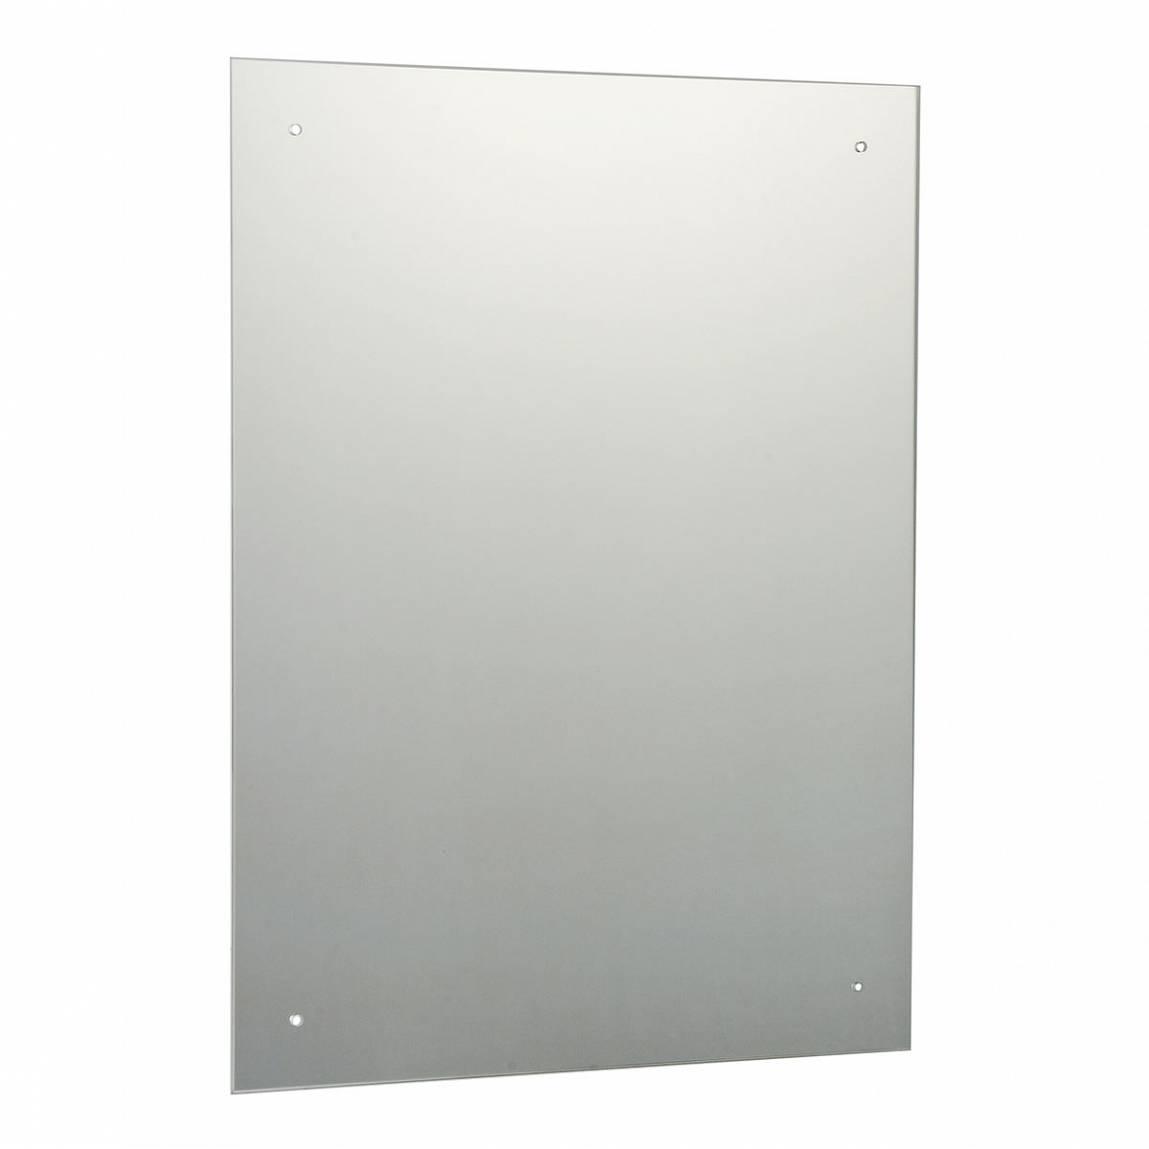 Image of Rectangular Drilled Mirror 60x45cm